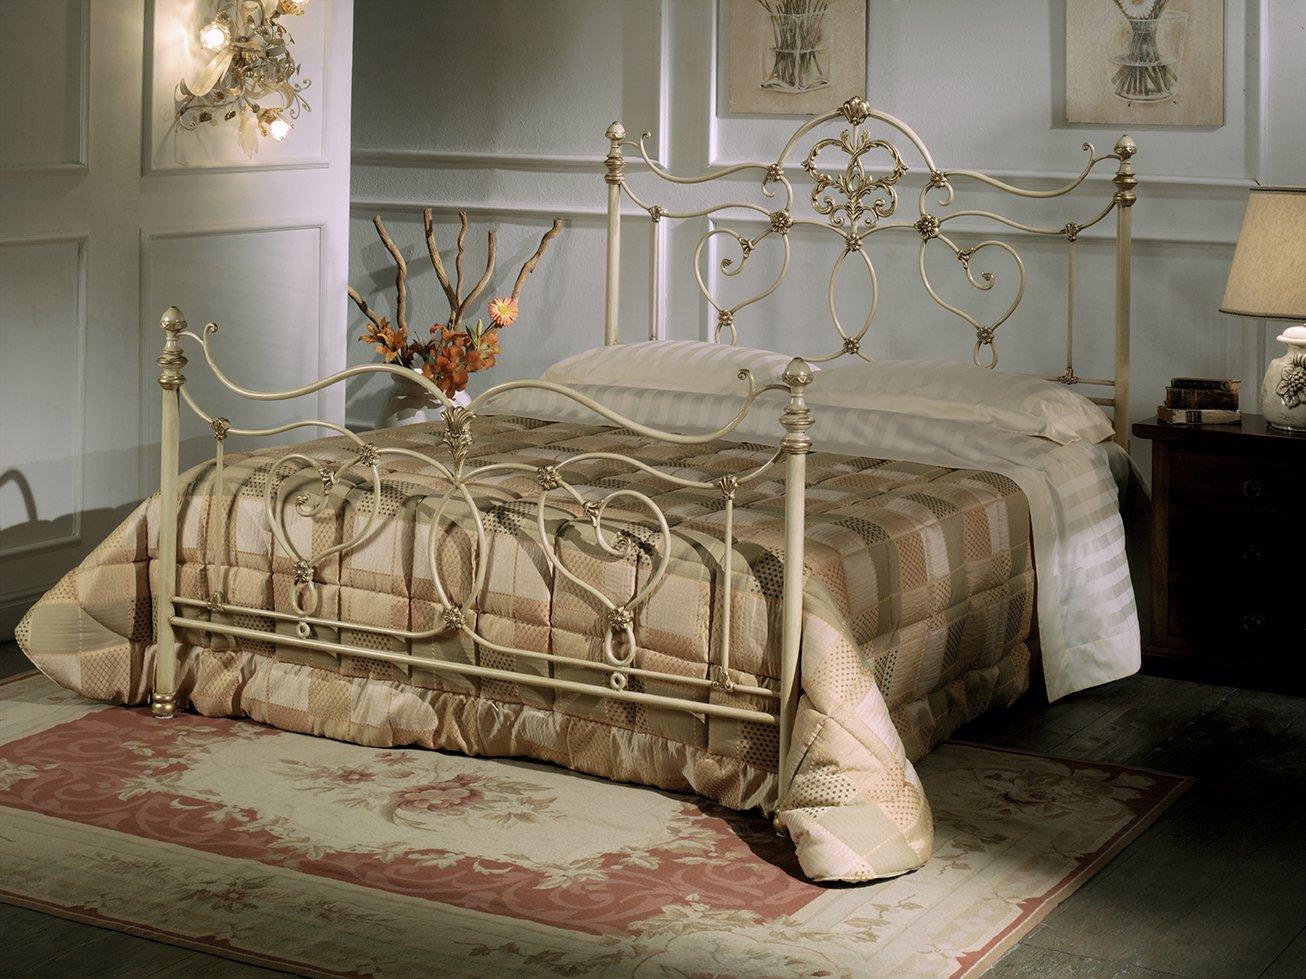 Il letto matrimoniale glamour